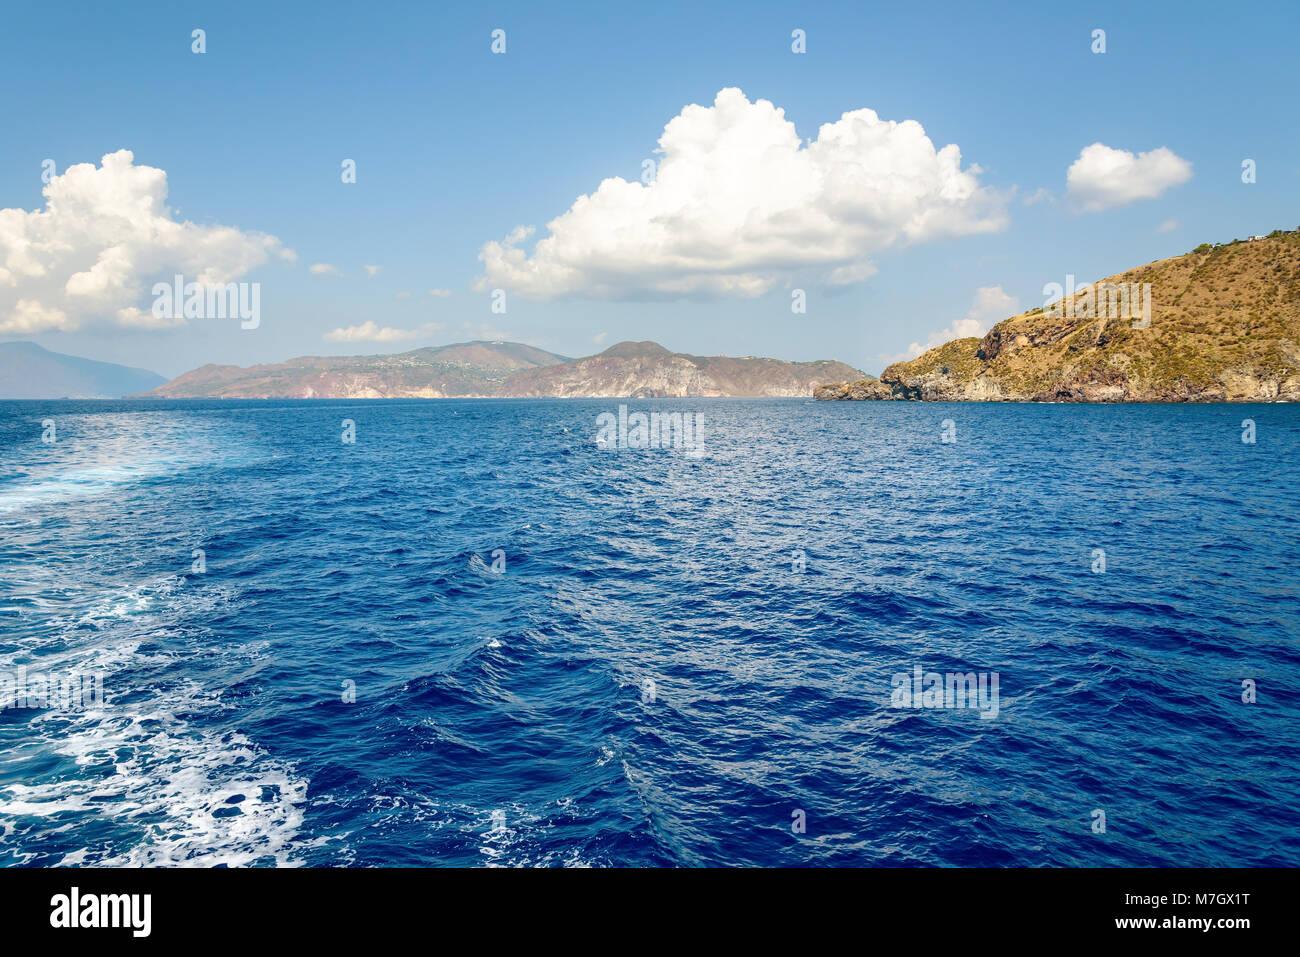 Summer view of Aeolian Islands archipelago, Italy Stock Photo